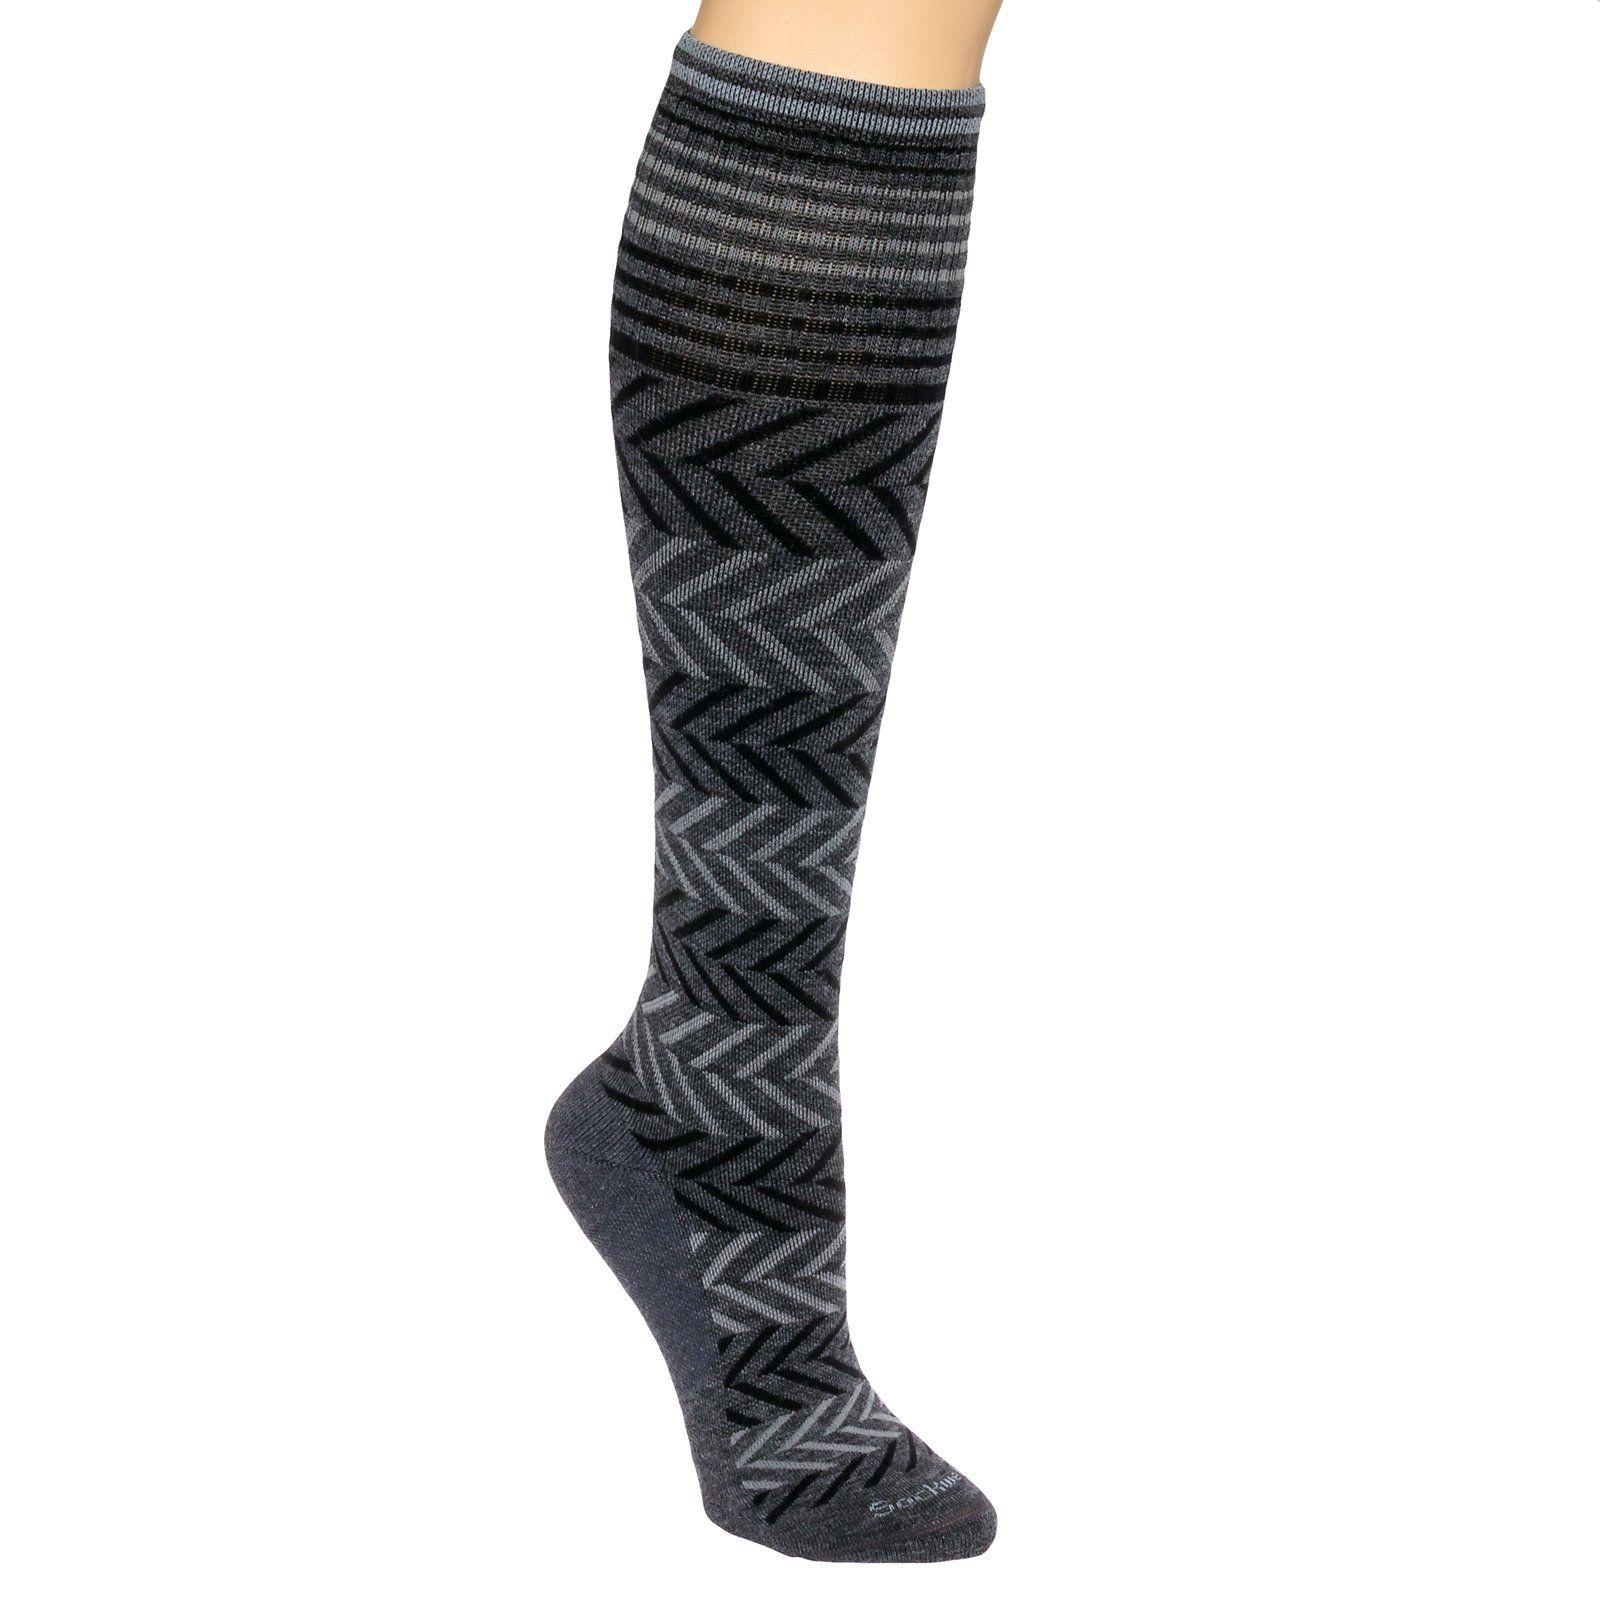 Sockwell Womens Chevron Circulator Compression Socks (Charcoal, M/L)